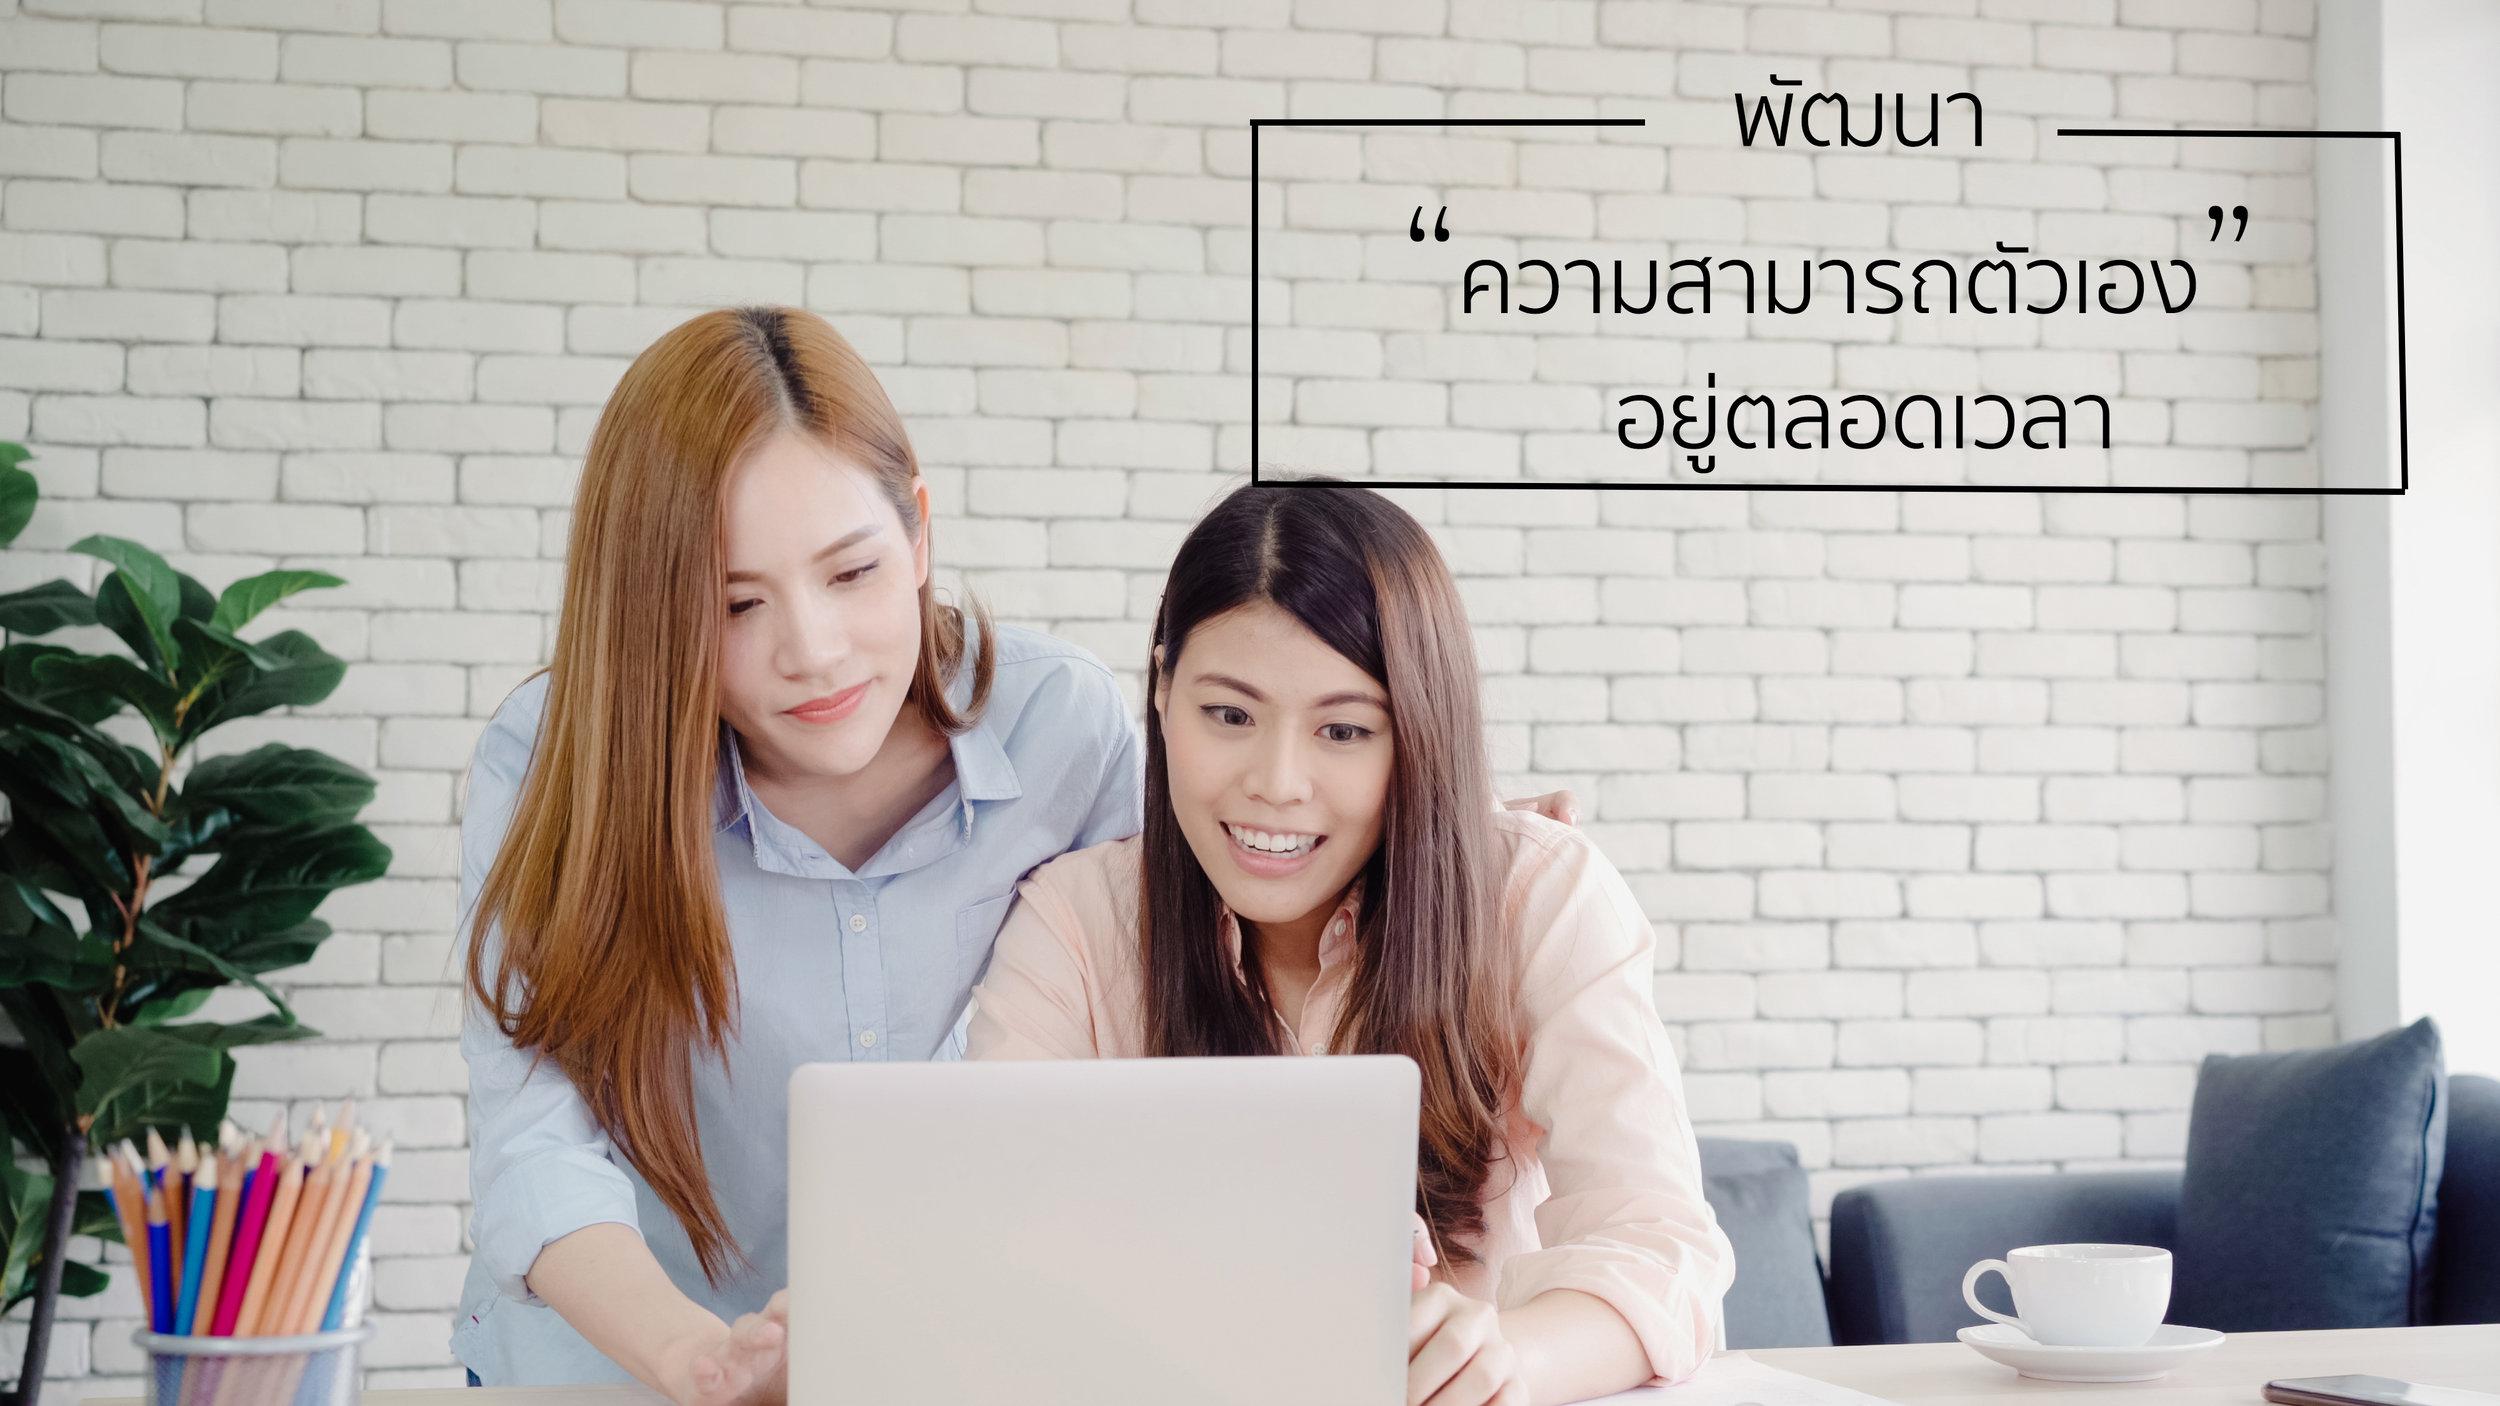 Attractive smart creative Asian business women in smart casual w